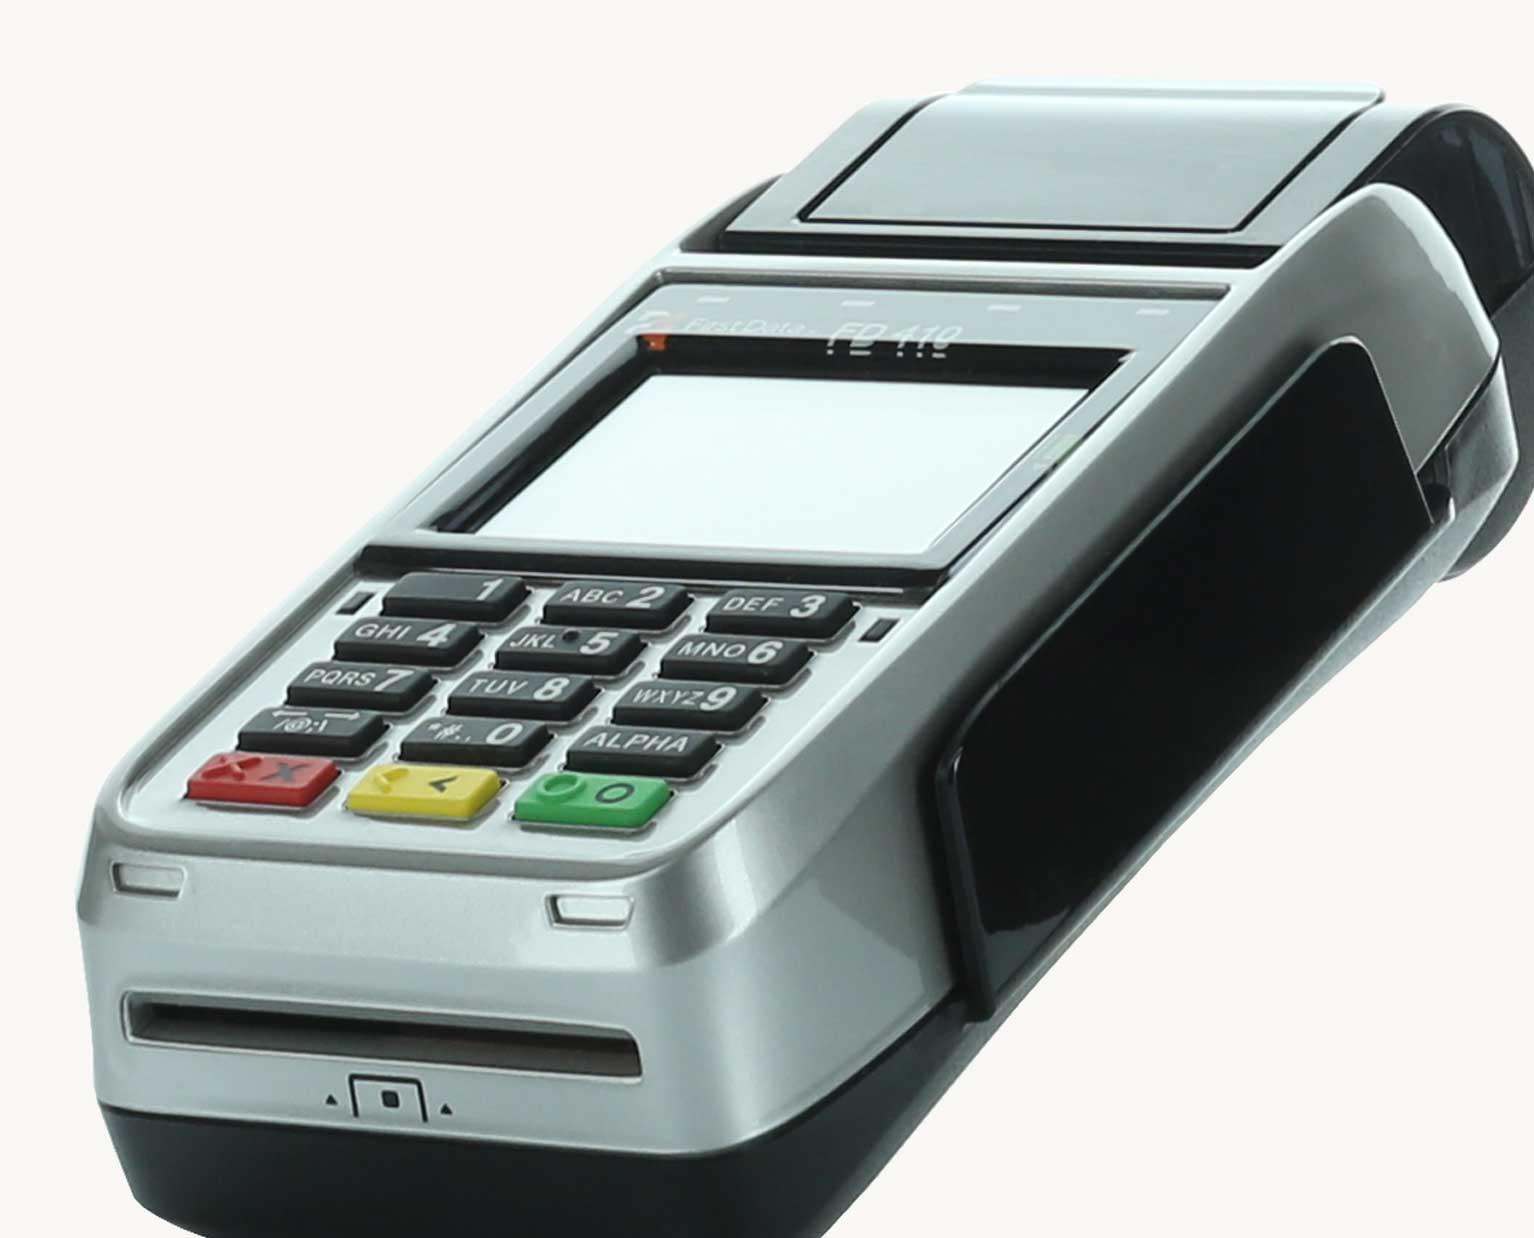 First Data FD410 Wireless EMV Credit Card Terminal